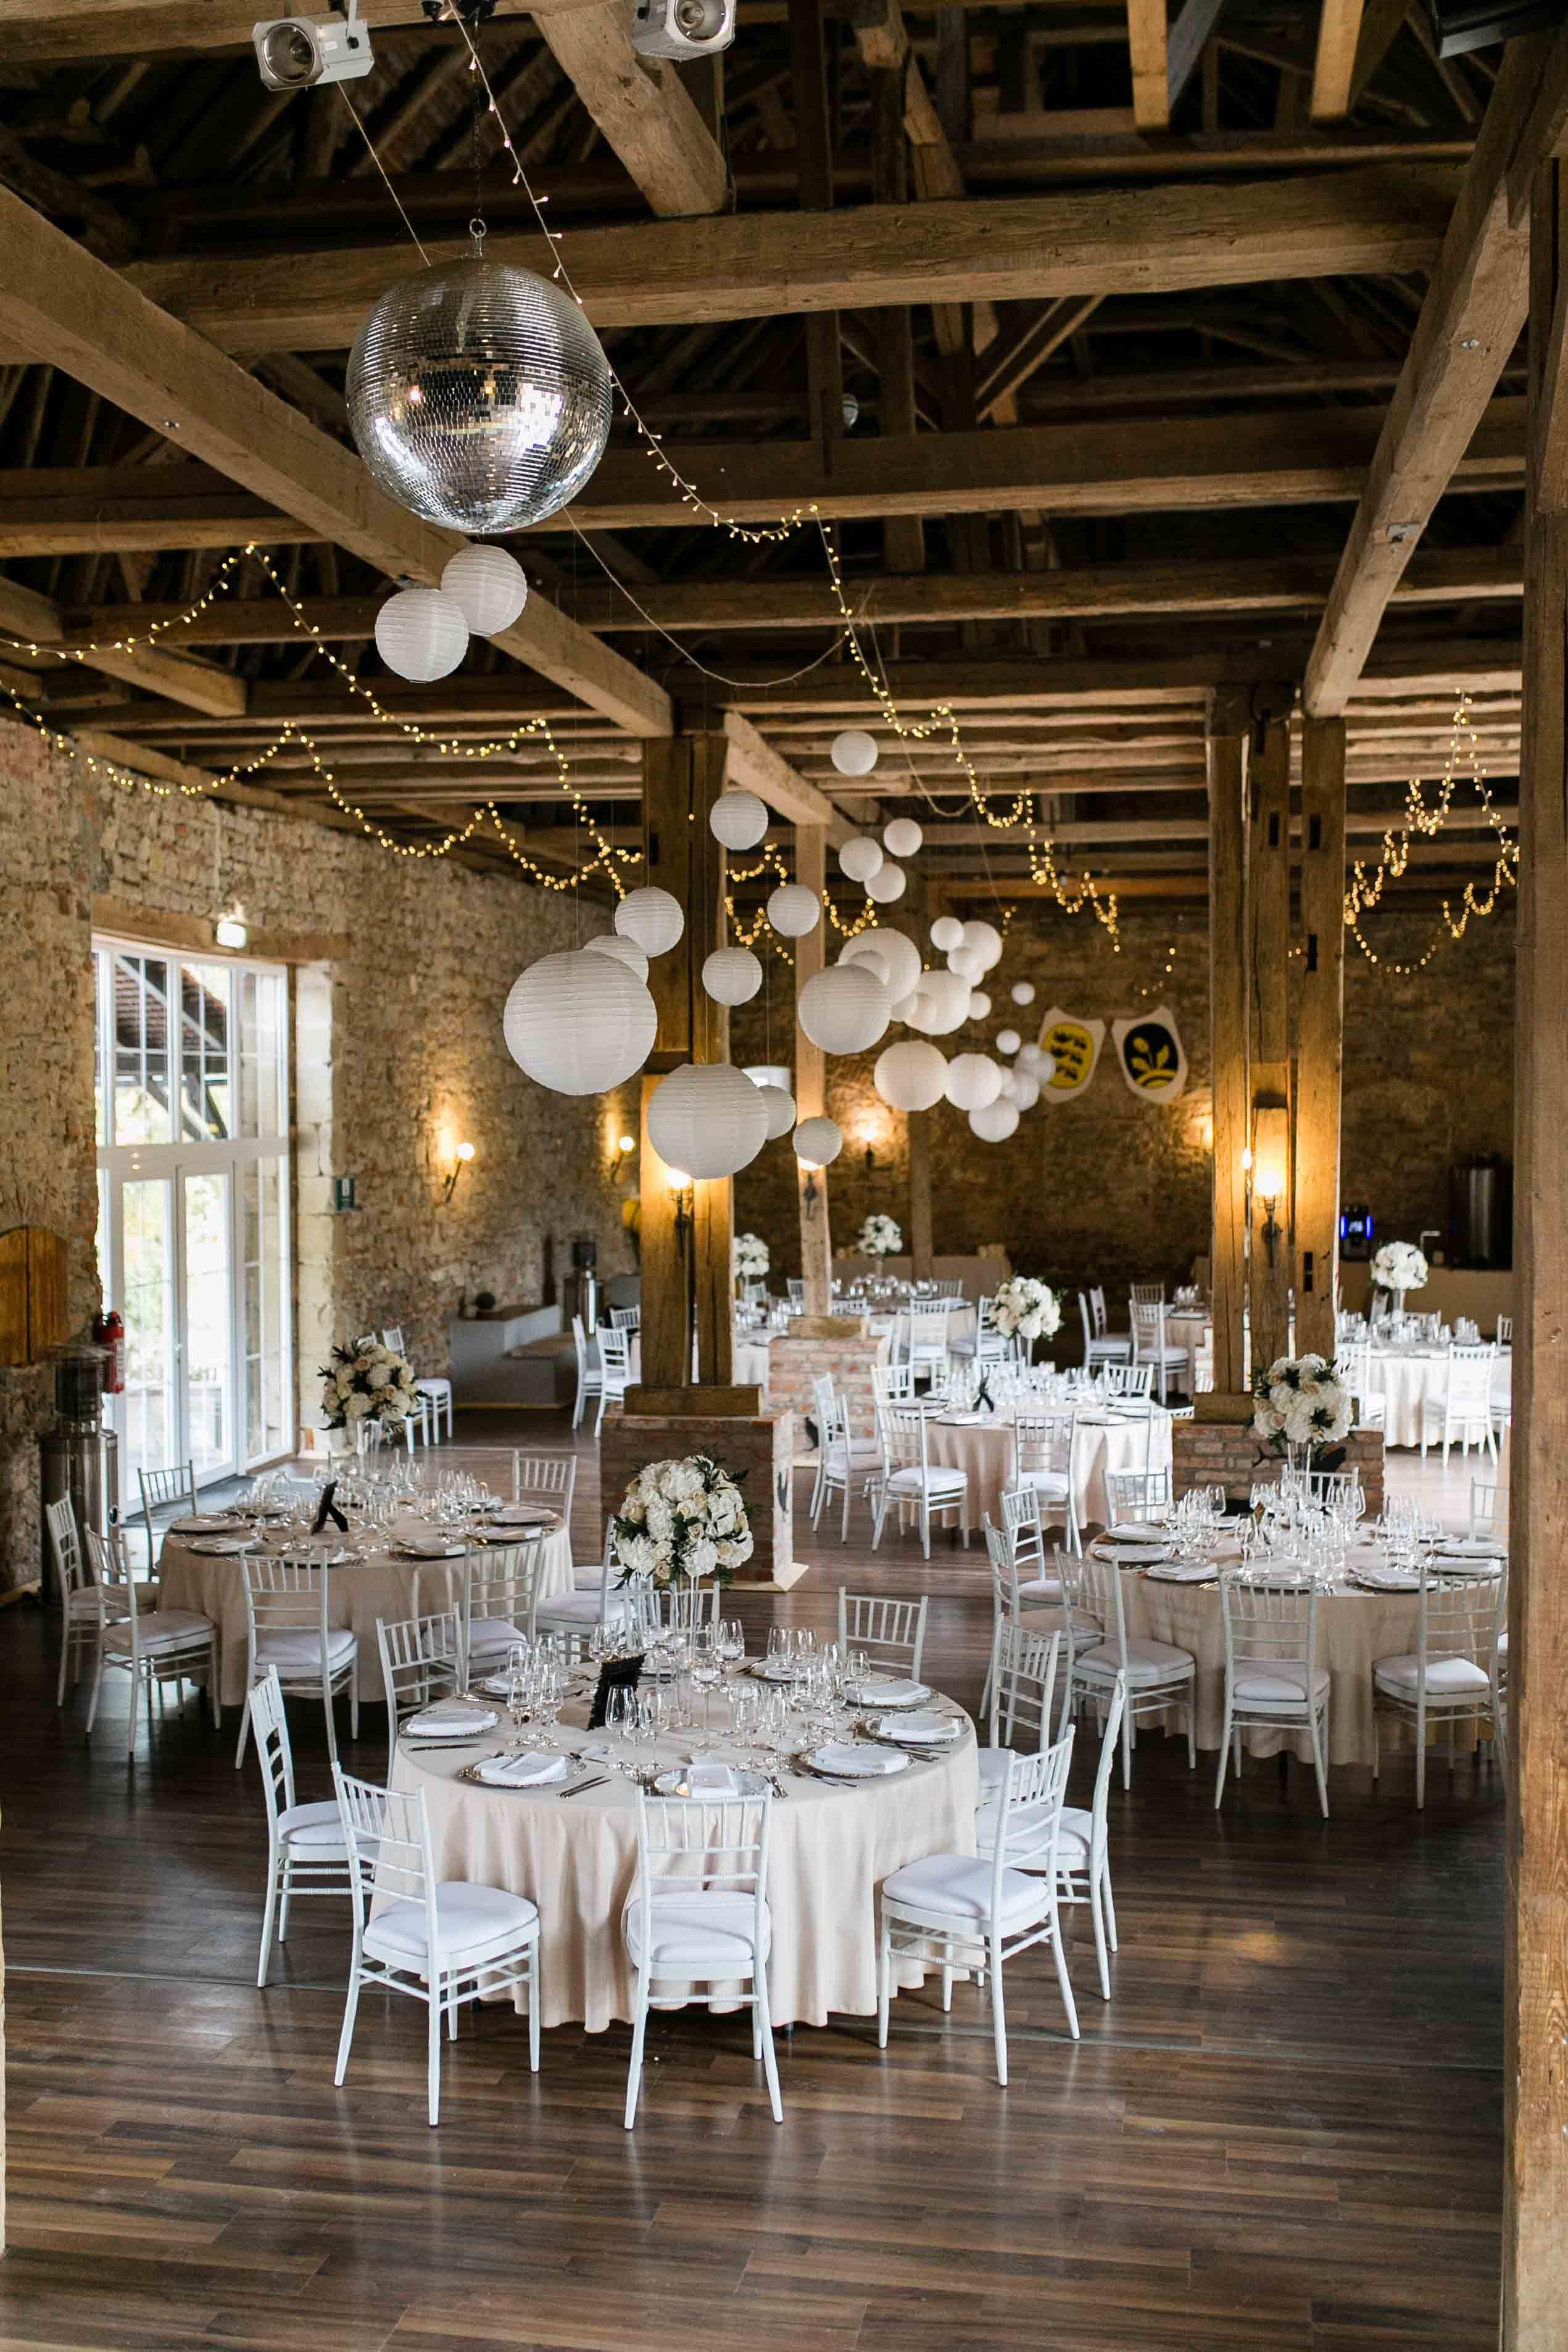 Eventscheune Schloss Assumstadt Hochzeitslocation Heiraten Hochzeitsfotograf